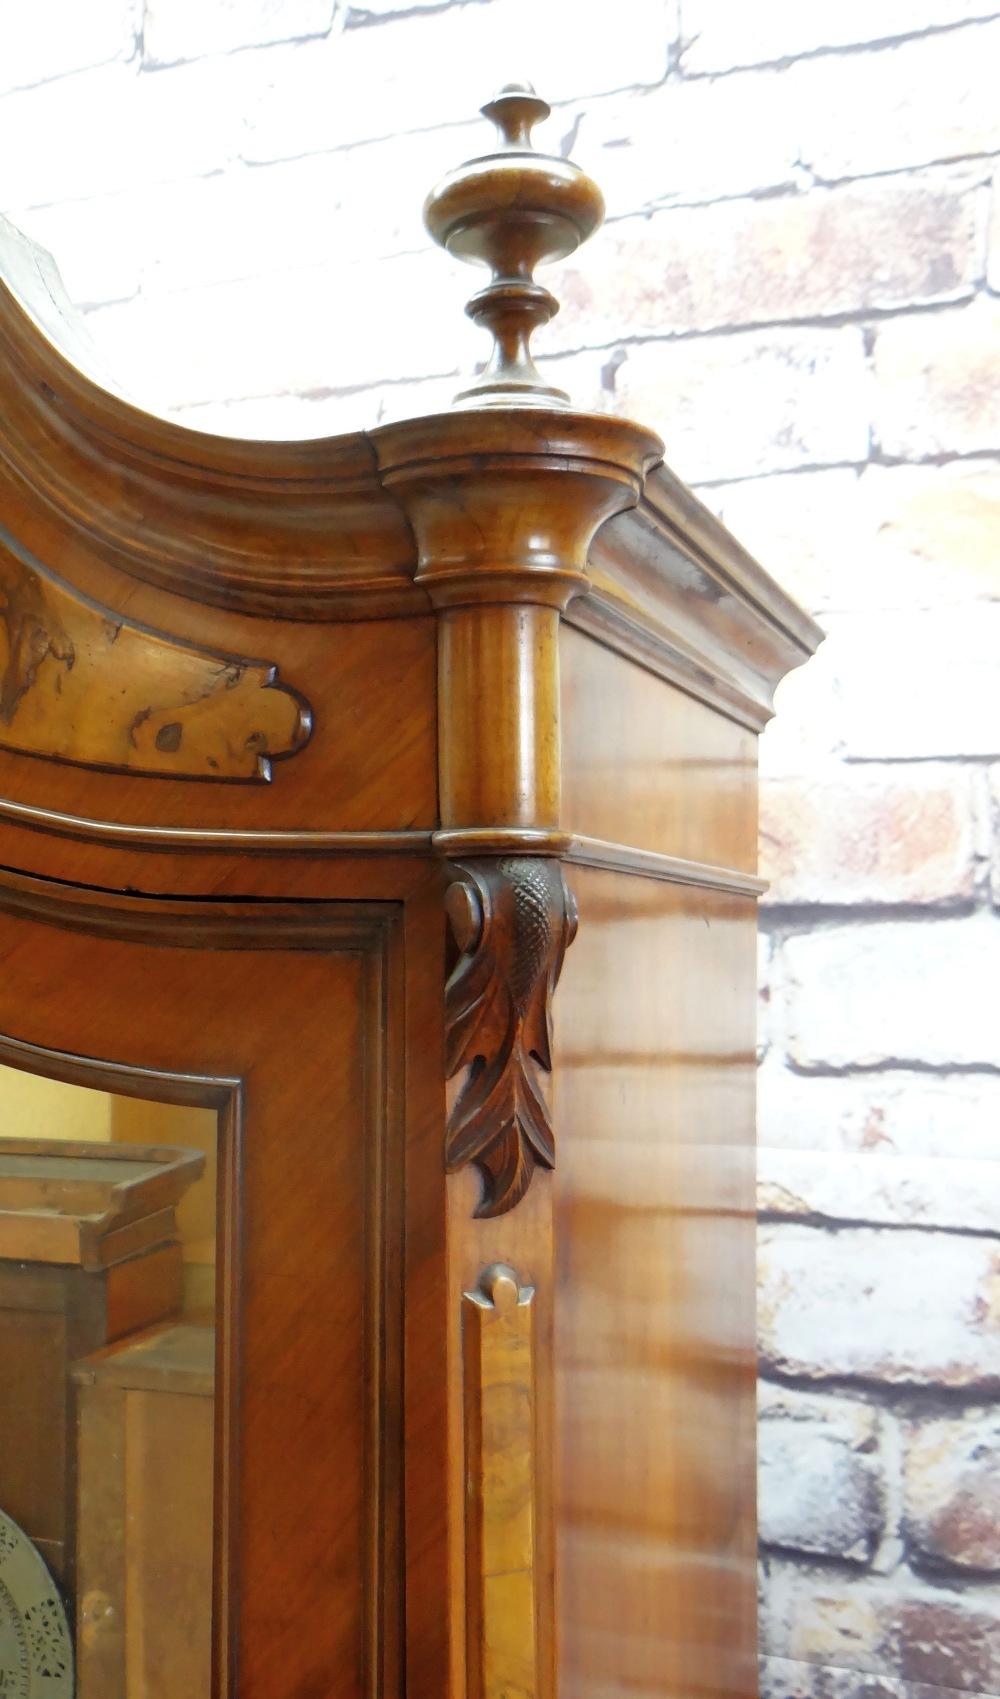 STYLISH FRENCH WALNUT & BURR WALNUT ARMOIRE, arched cornice with turned finials, mirror-glazed - Image 3 of 7